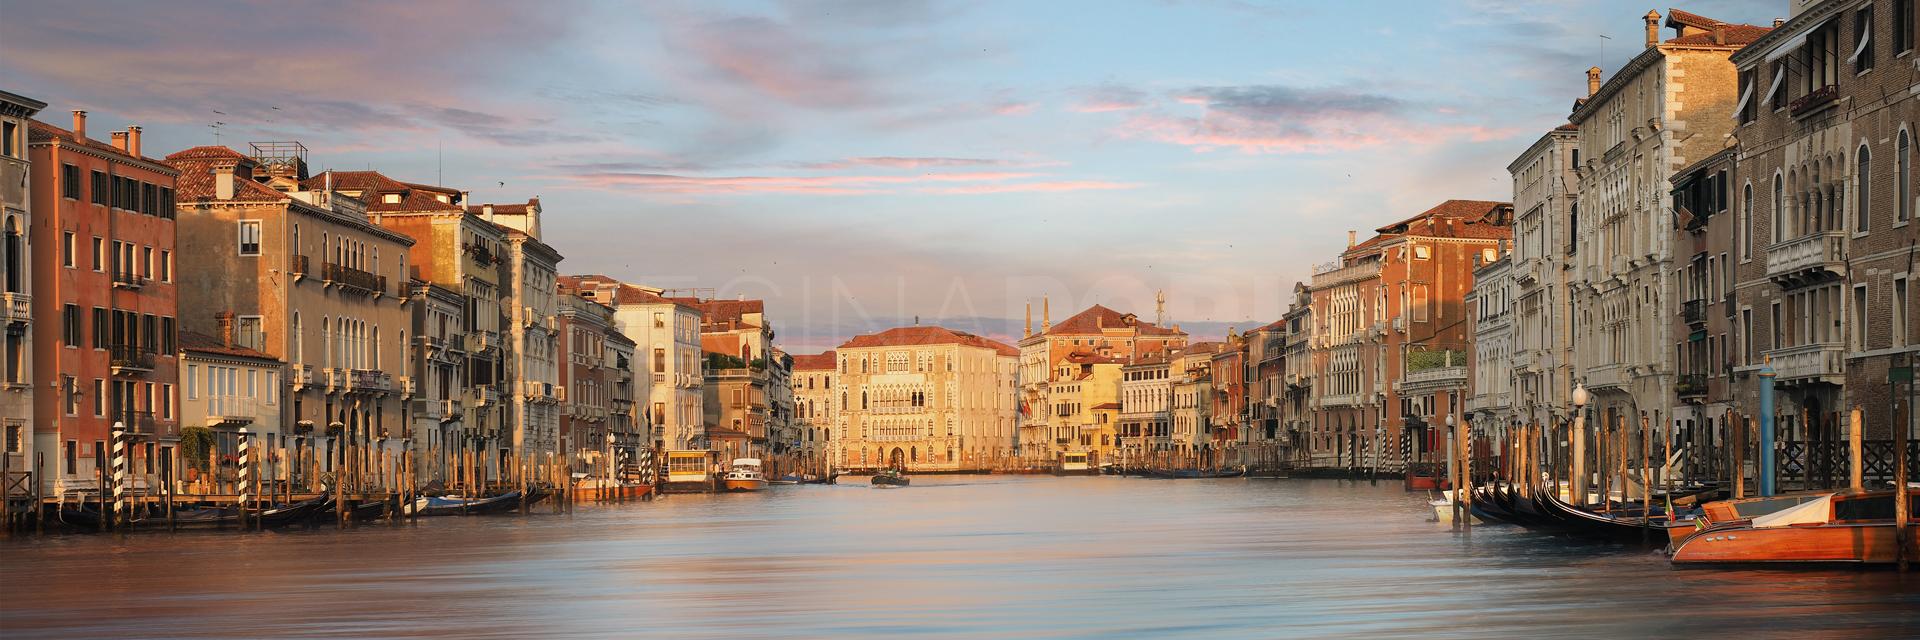 Venedig 48 Fotografie  –  90 x 30 cm  – Alu Dibond Plexi